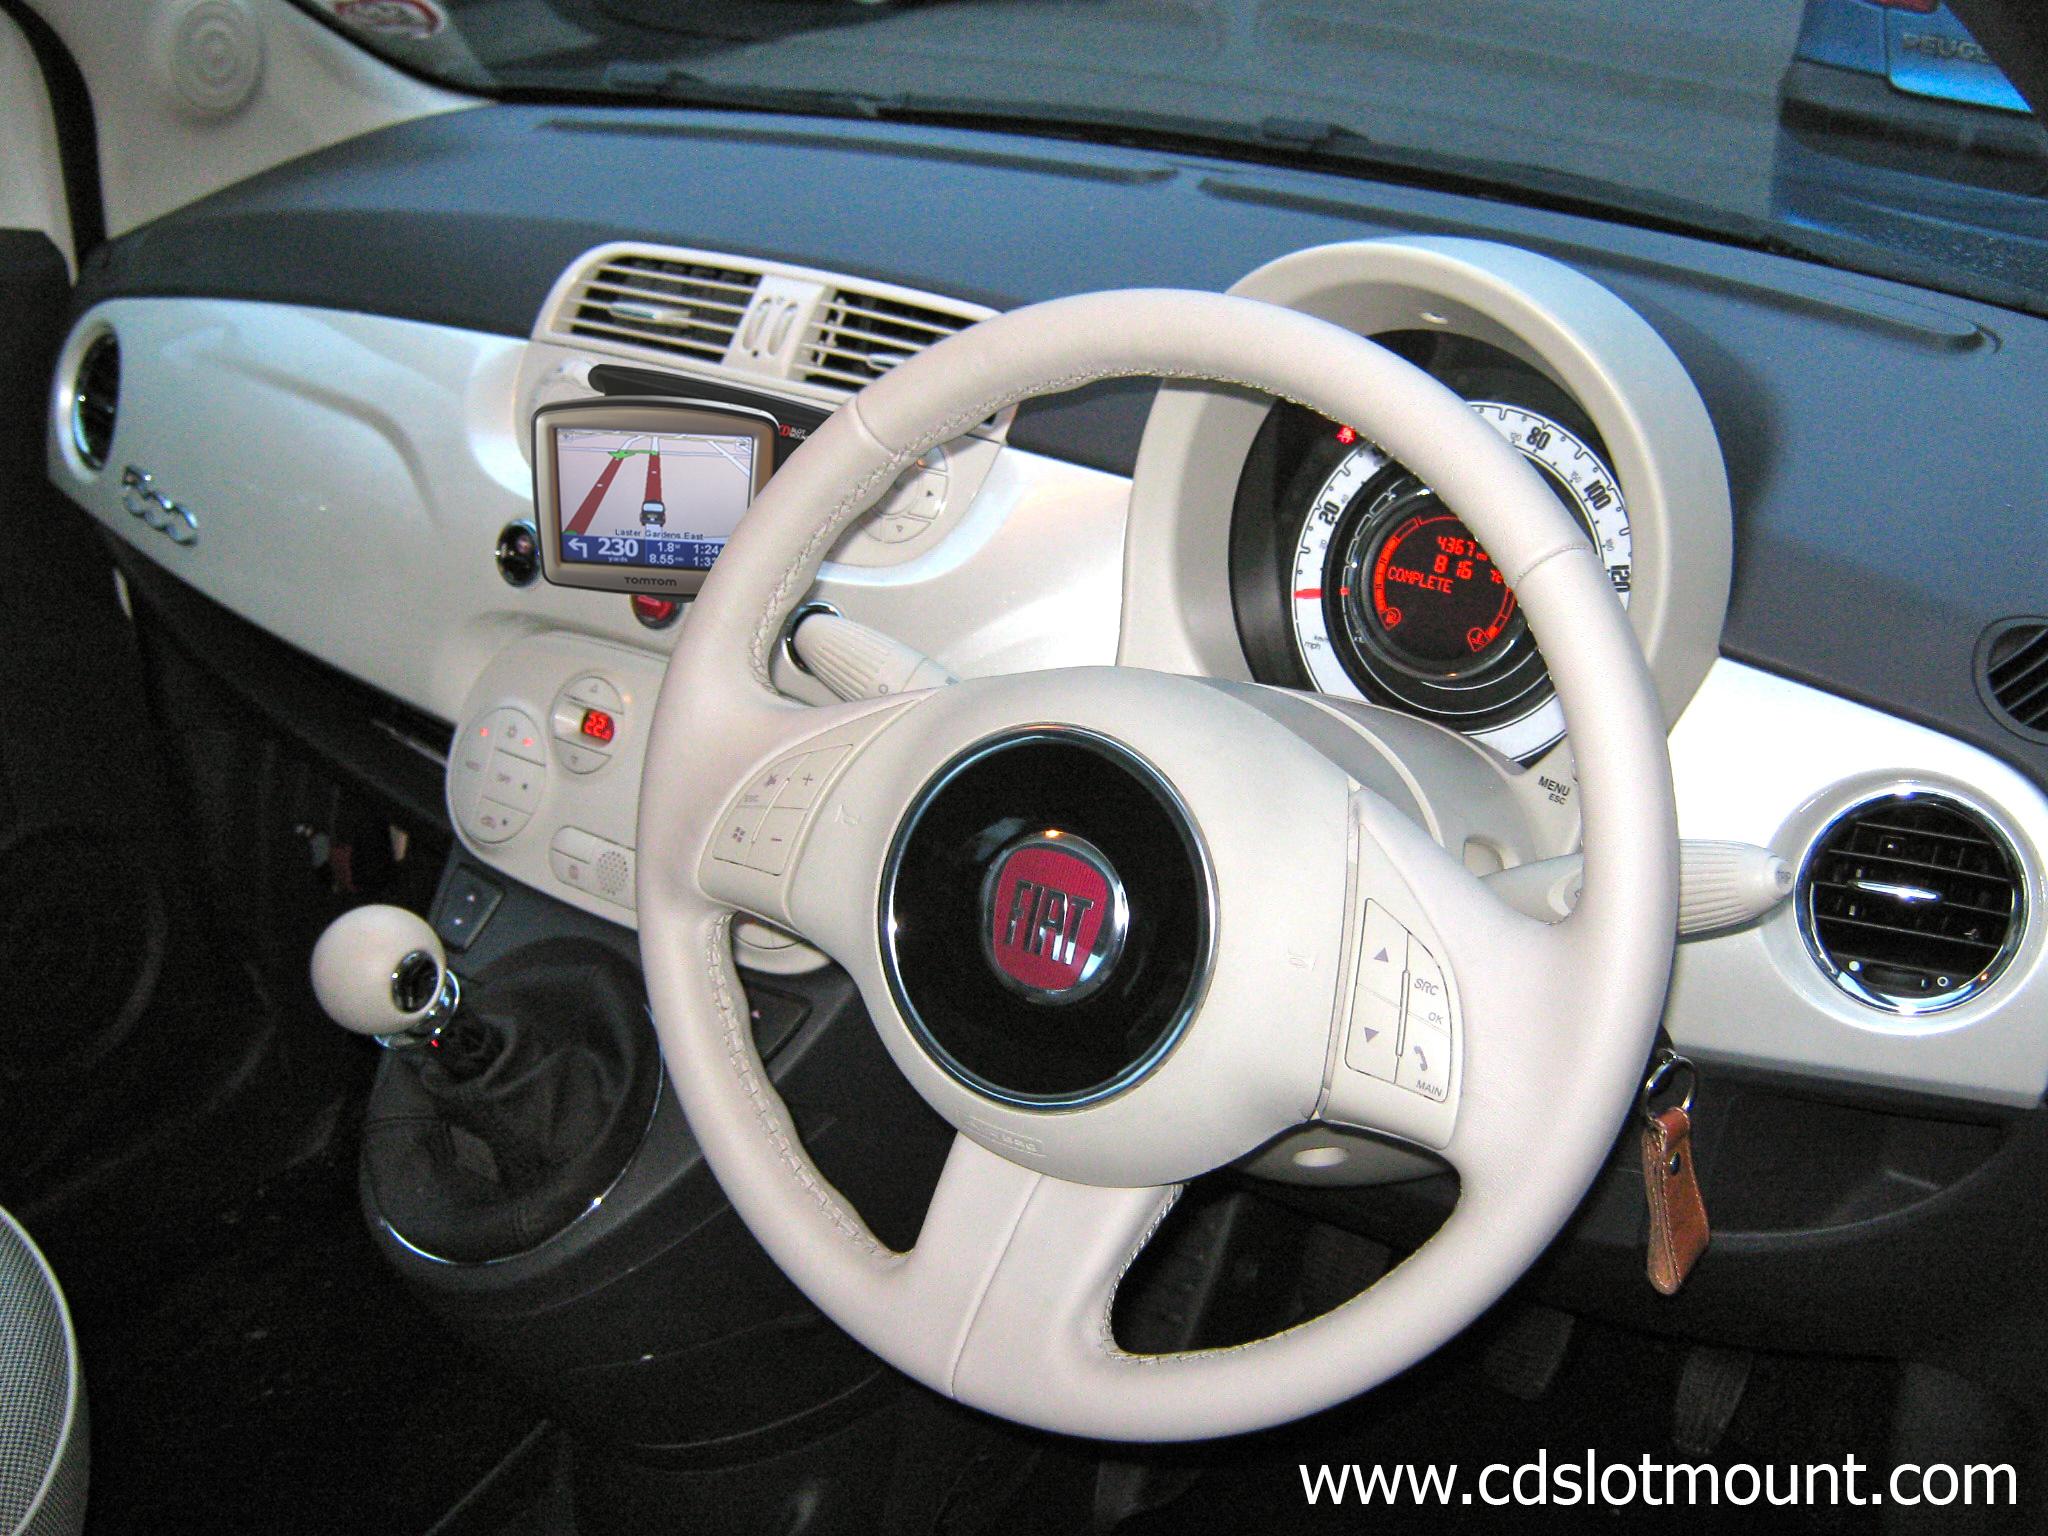 Fiat_500_White_www_cdslotmount